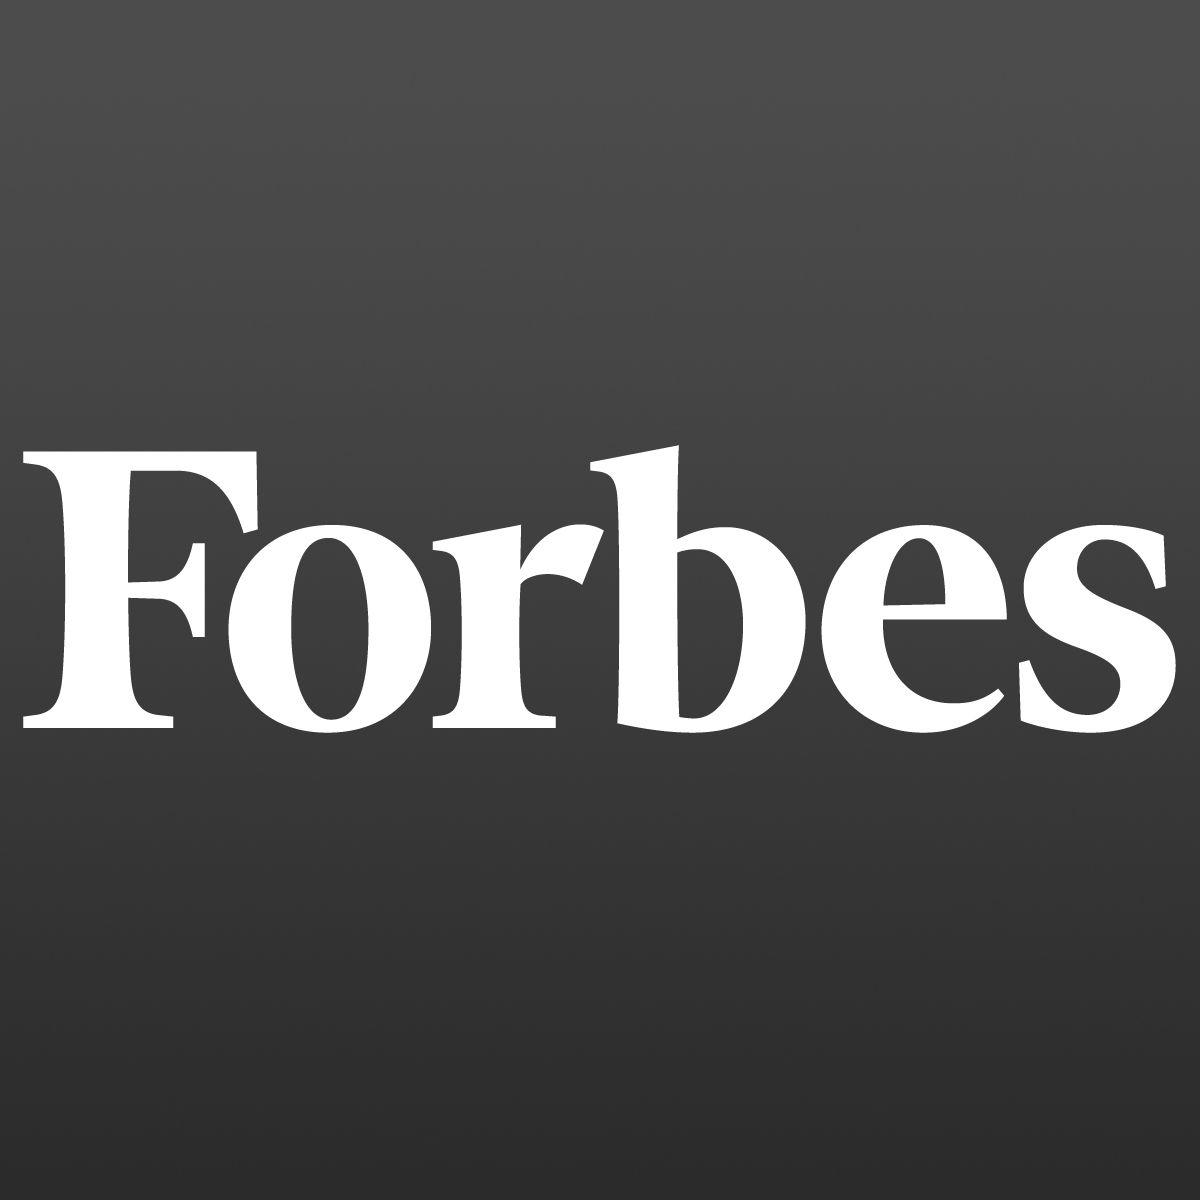 Forbes Algorithmic Bias News Article